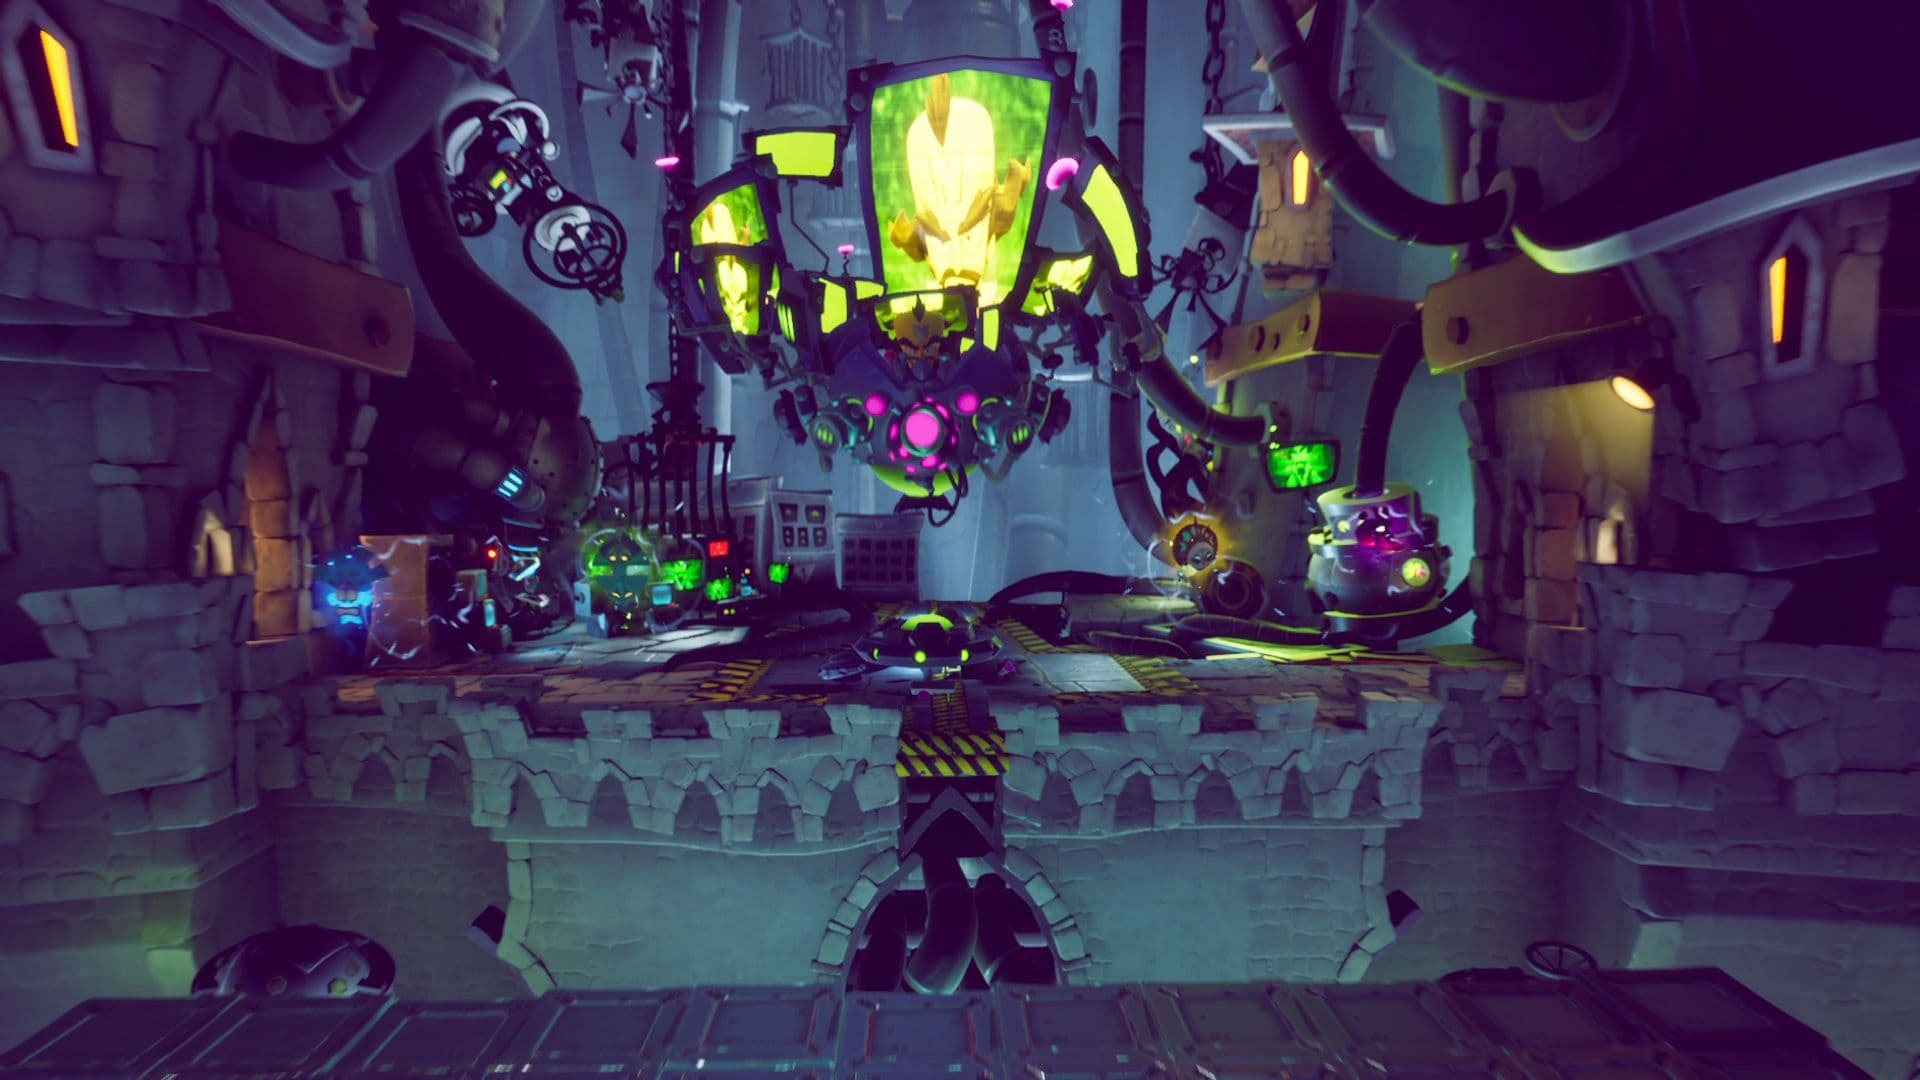 Crash Bandicoot 4: It's About Time Xbox